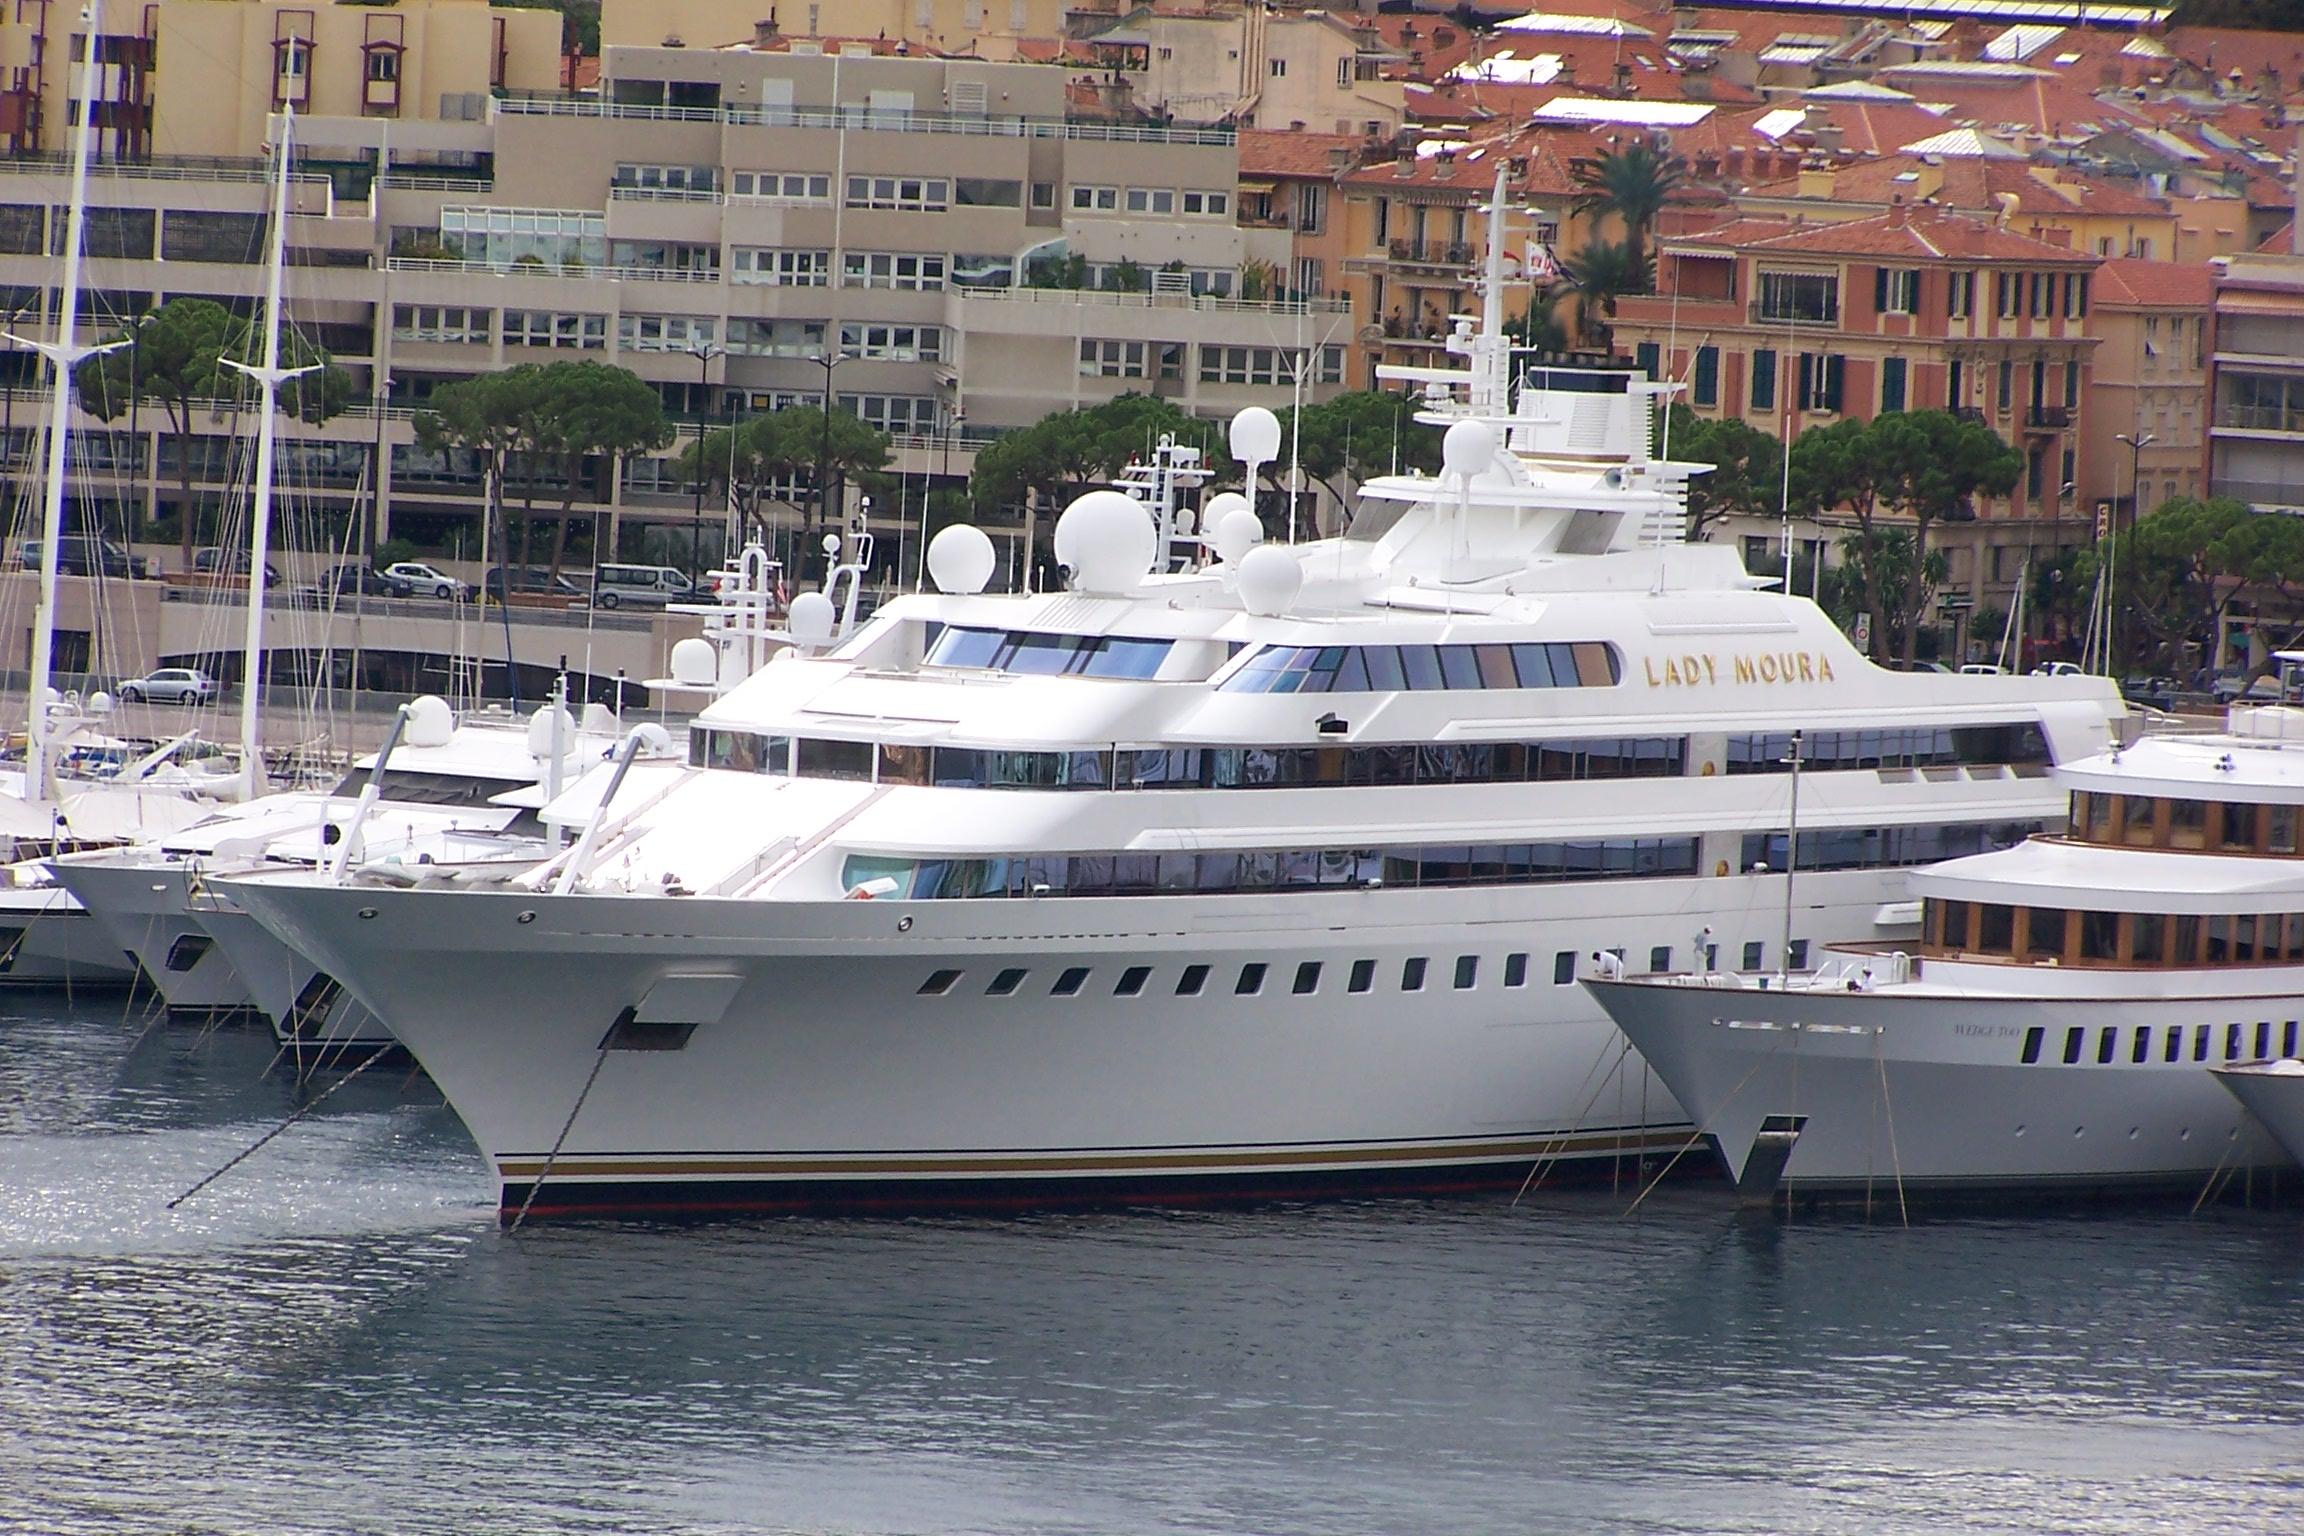 Yacht_Lady_Moura_in_Monaco